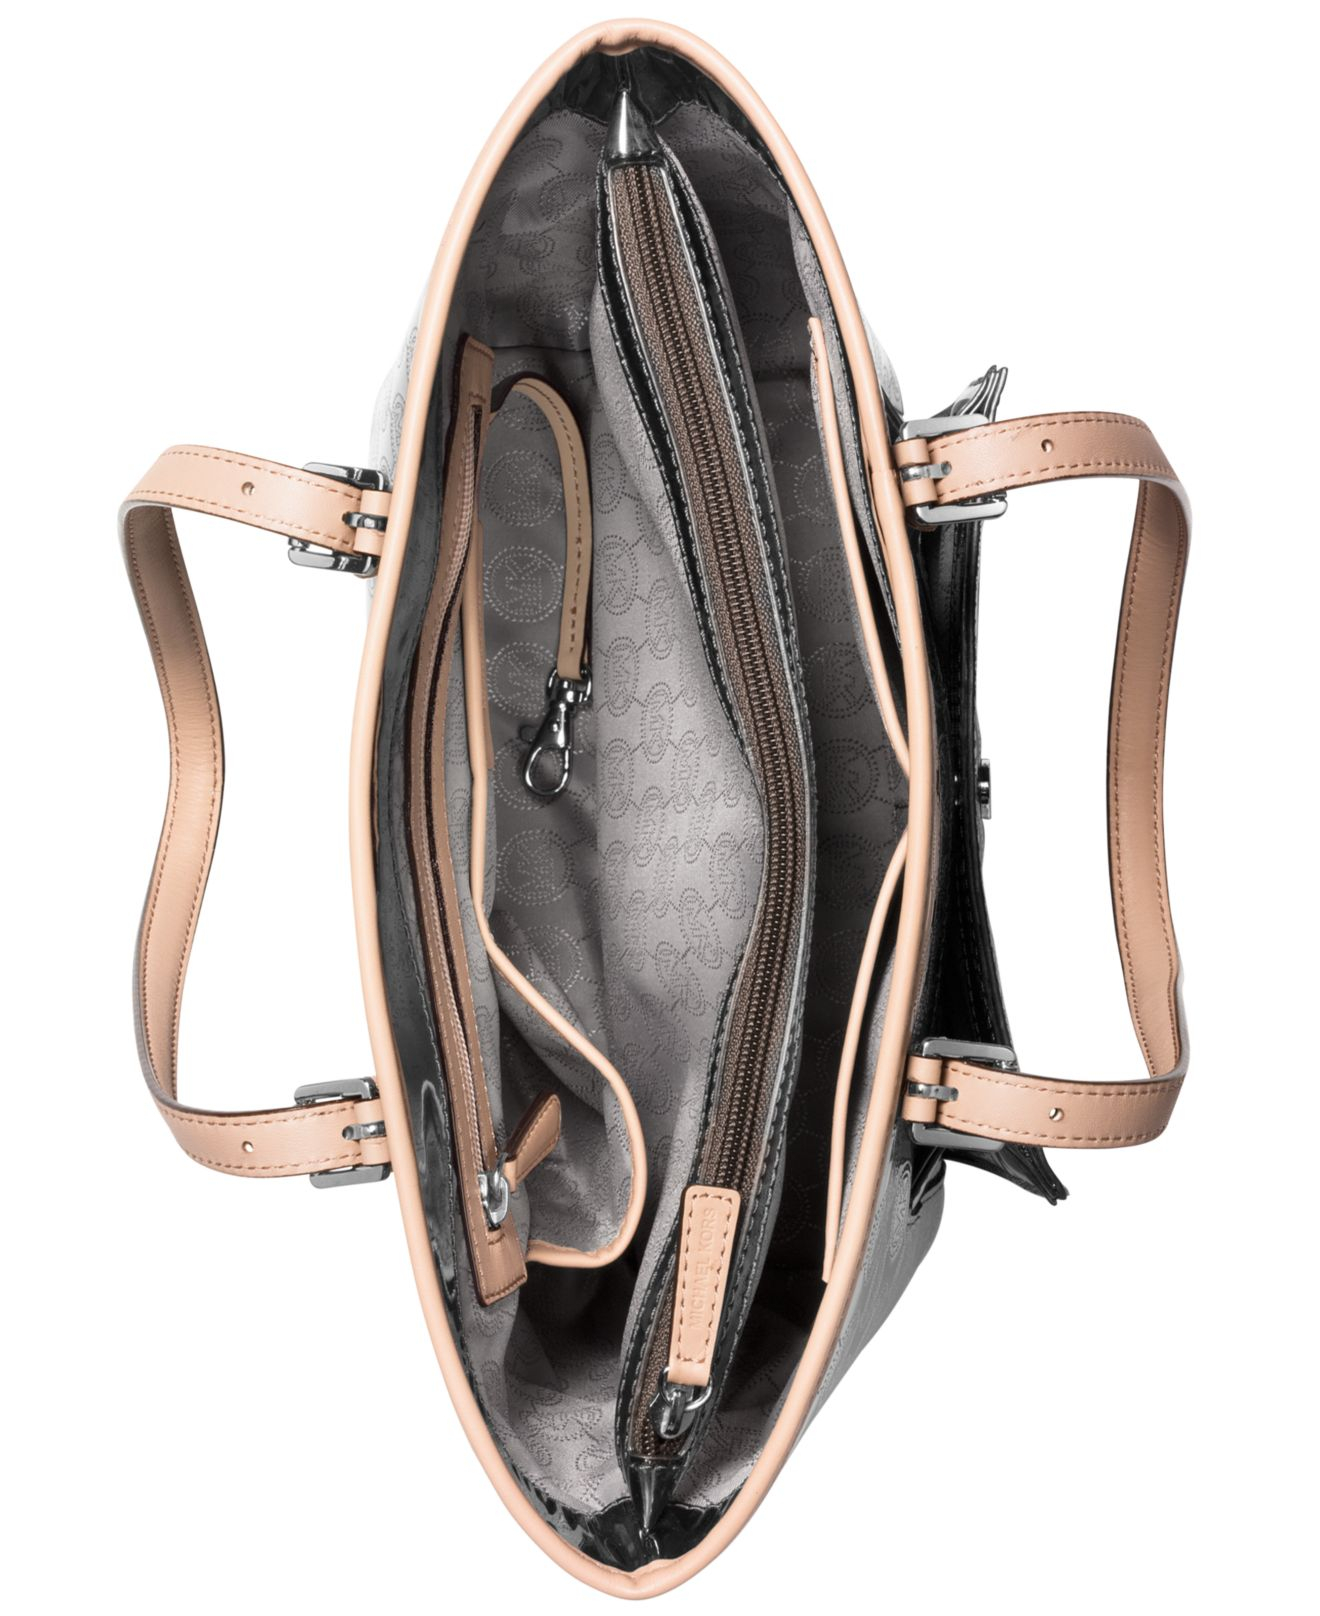 michael kors jet set item medium snap pocket tote equilibrium studio. Black Bedroom Furniture Sets. Home Design Ideas